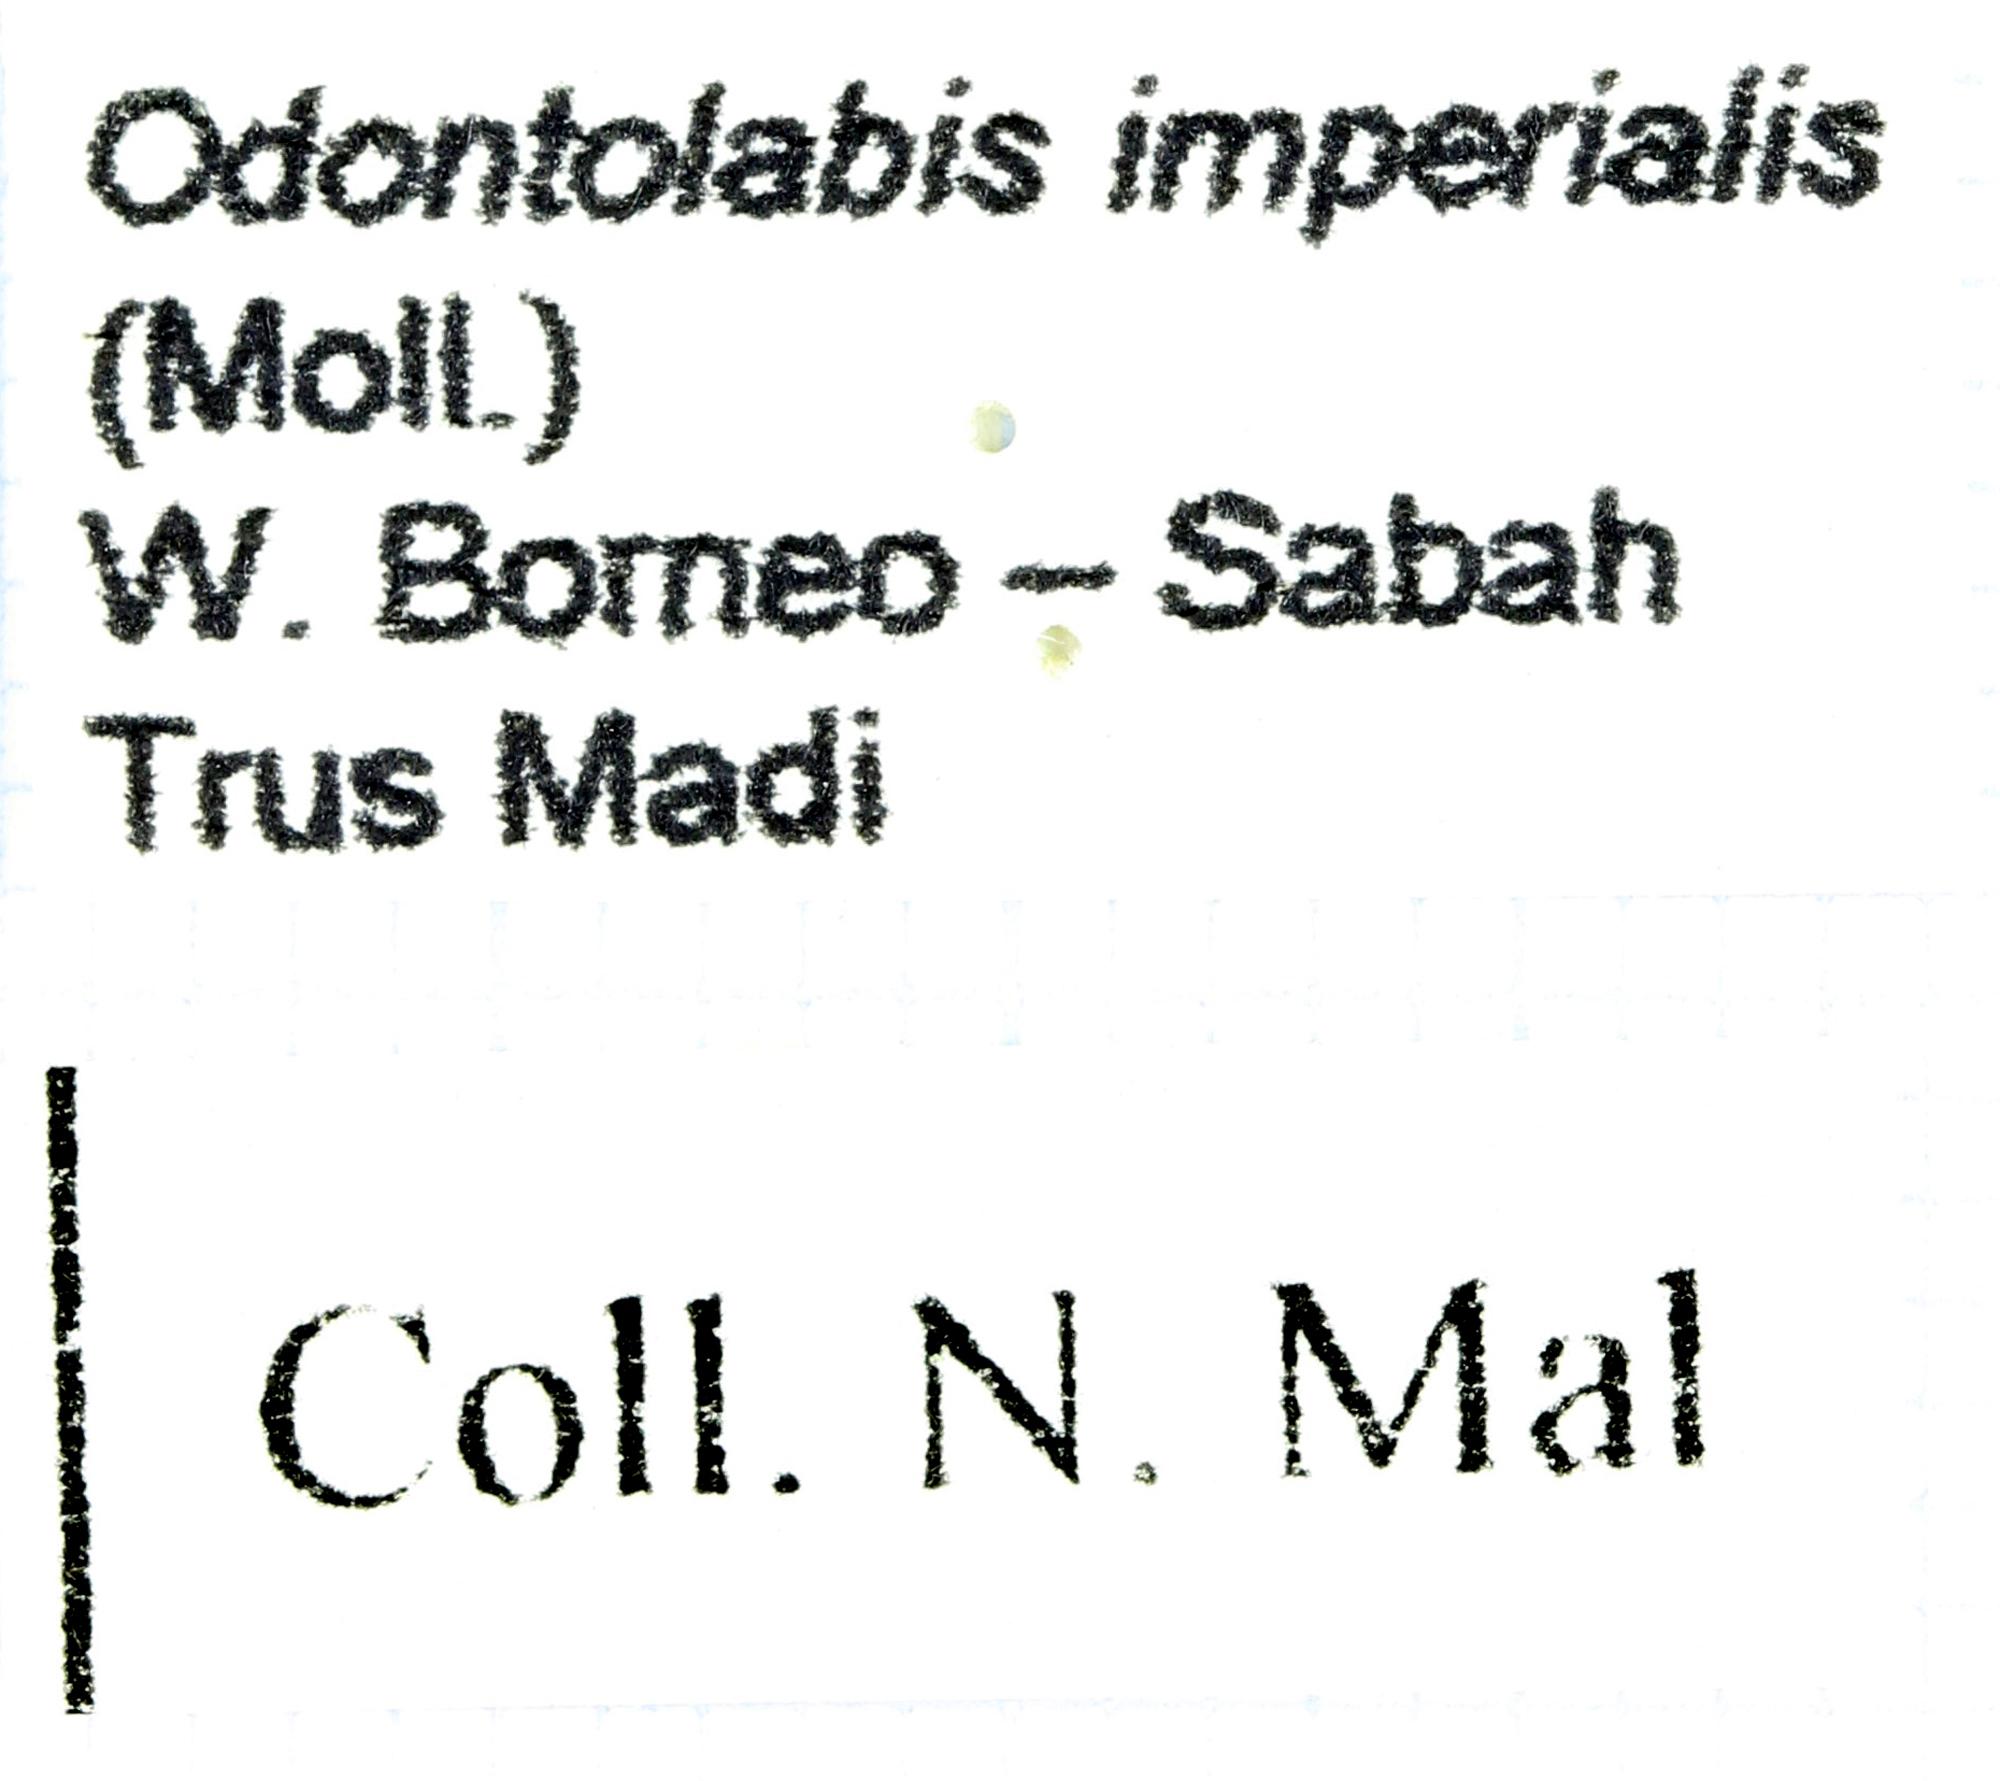 Odontolabis imperialis 29924.jpg